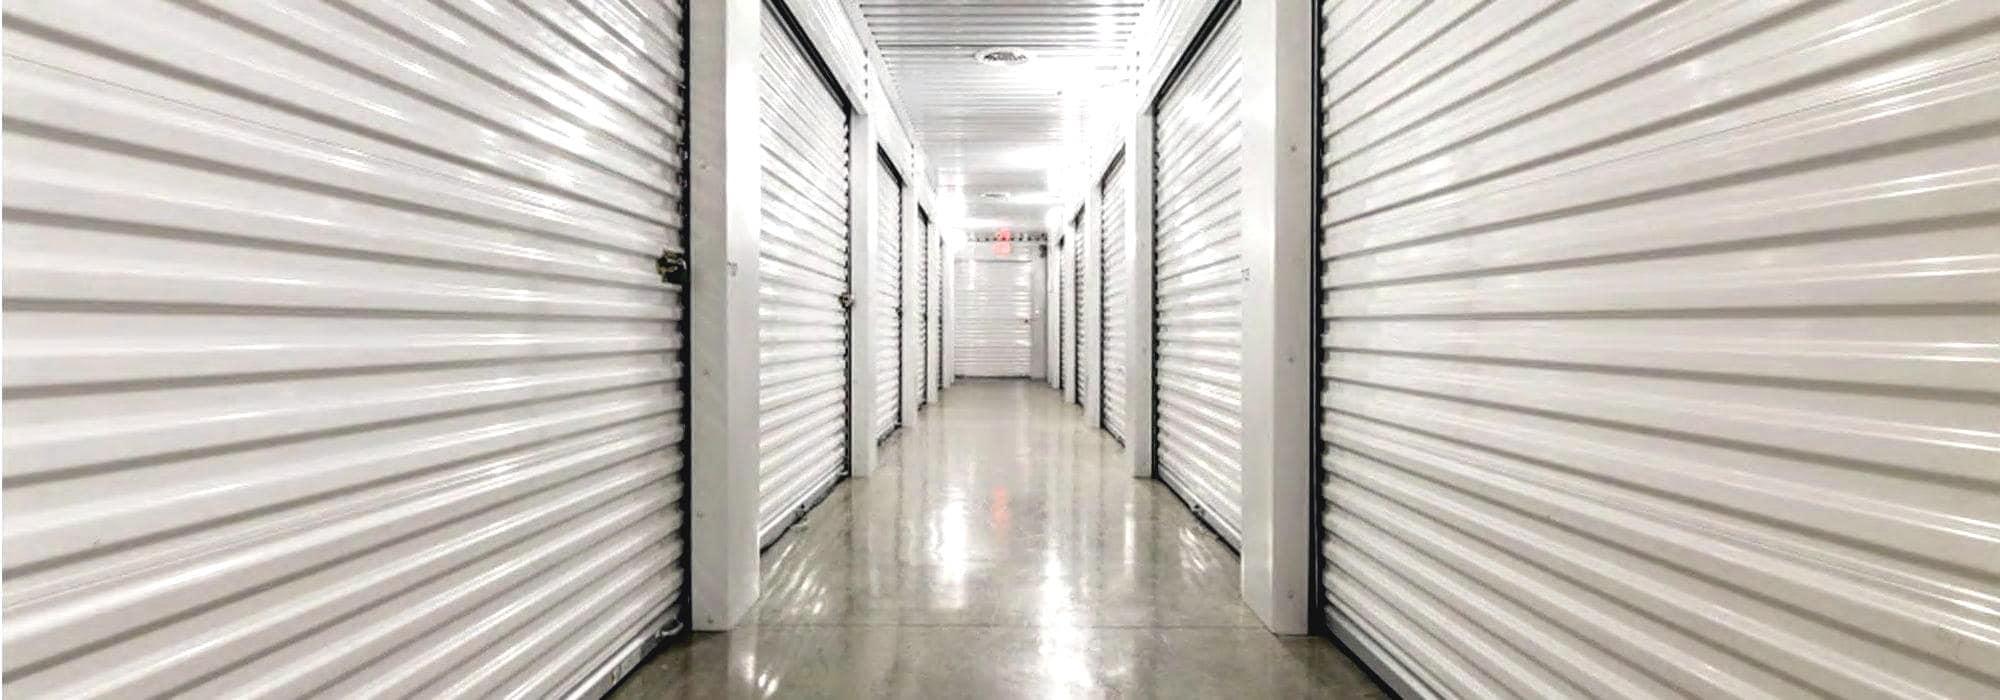 Self storage at Smart Space Self Storage in Richardson, Texas